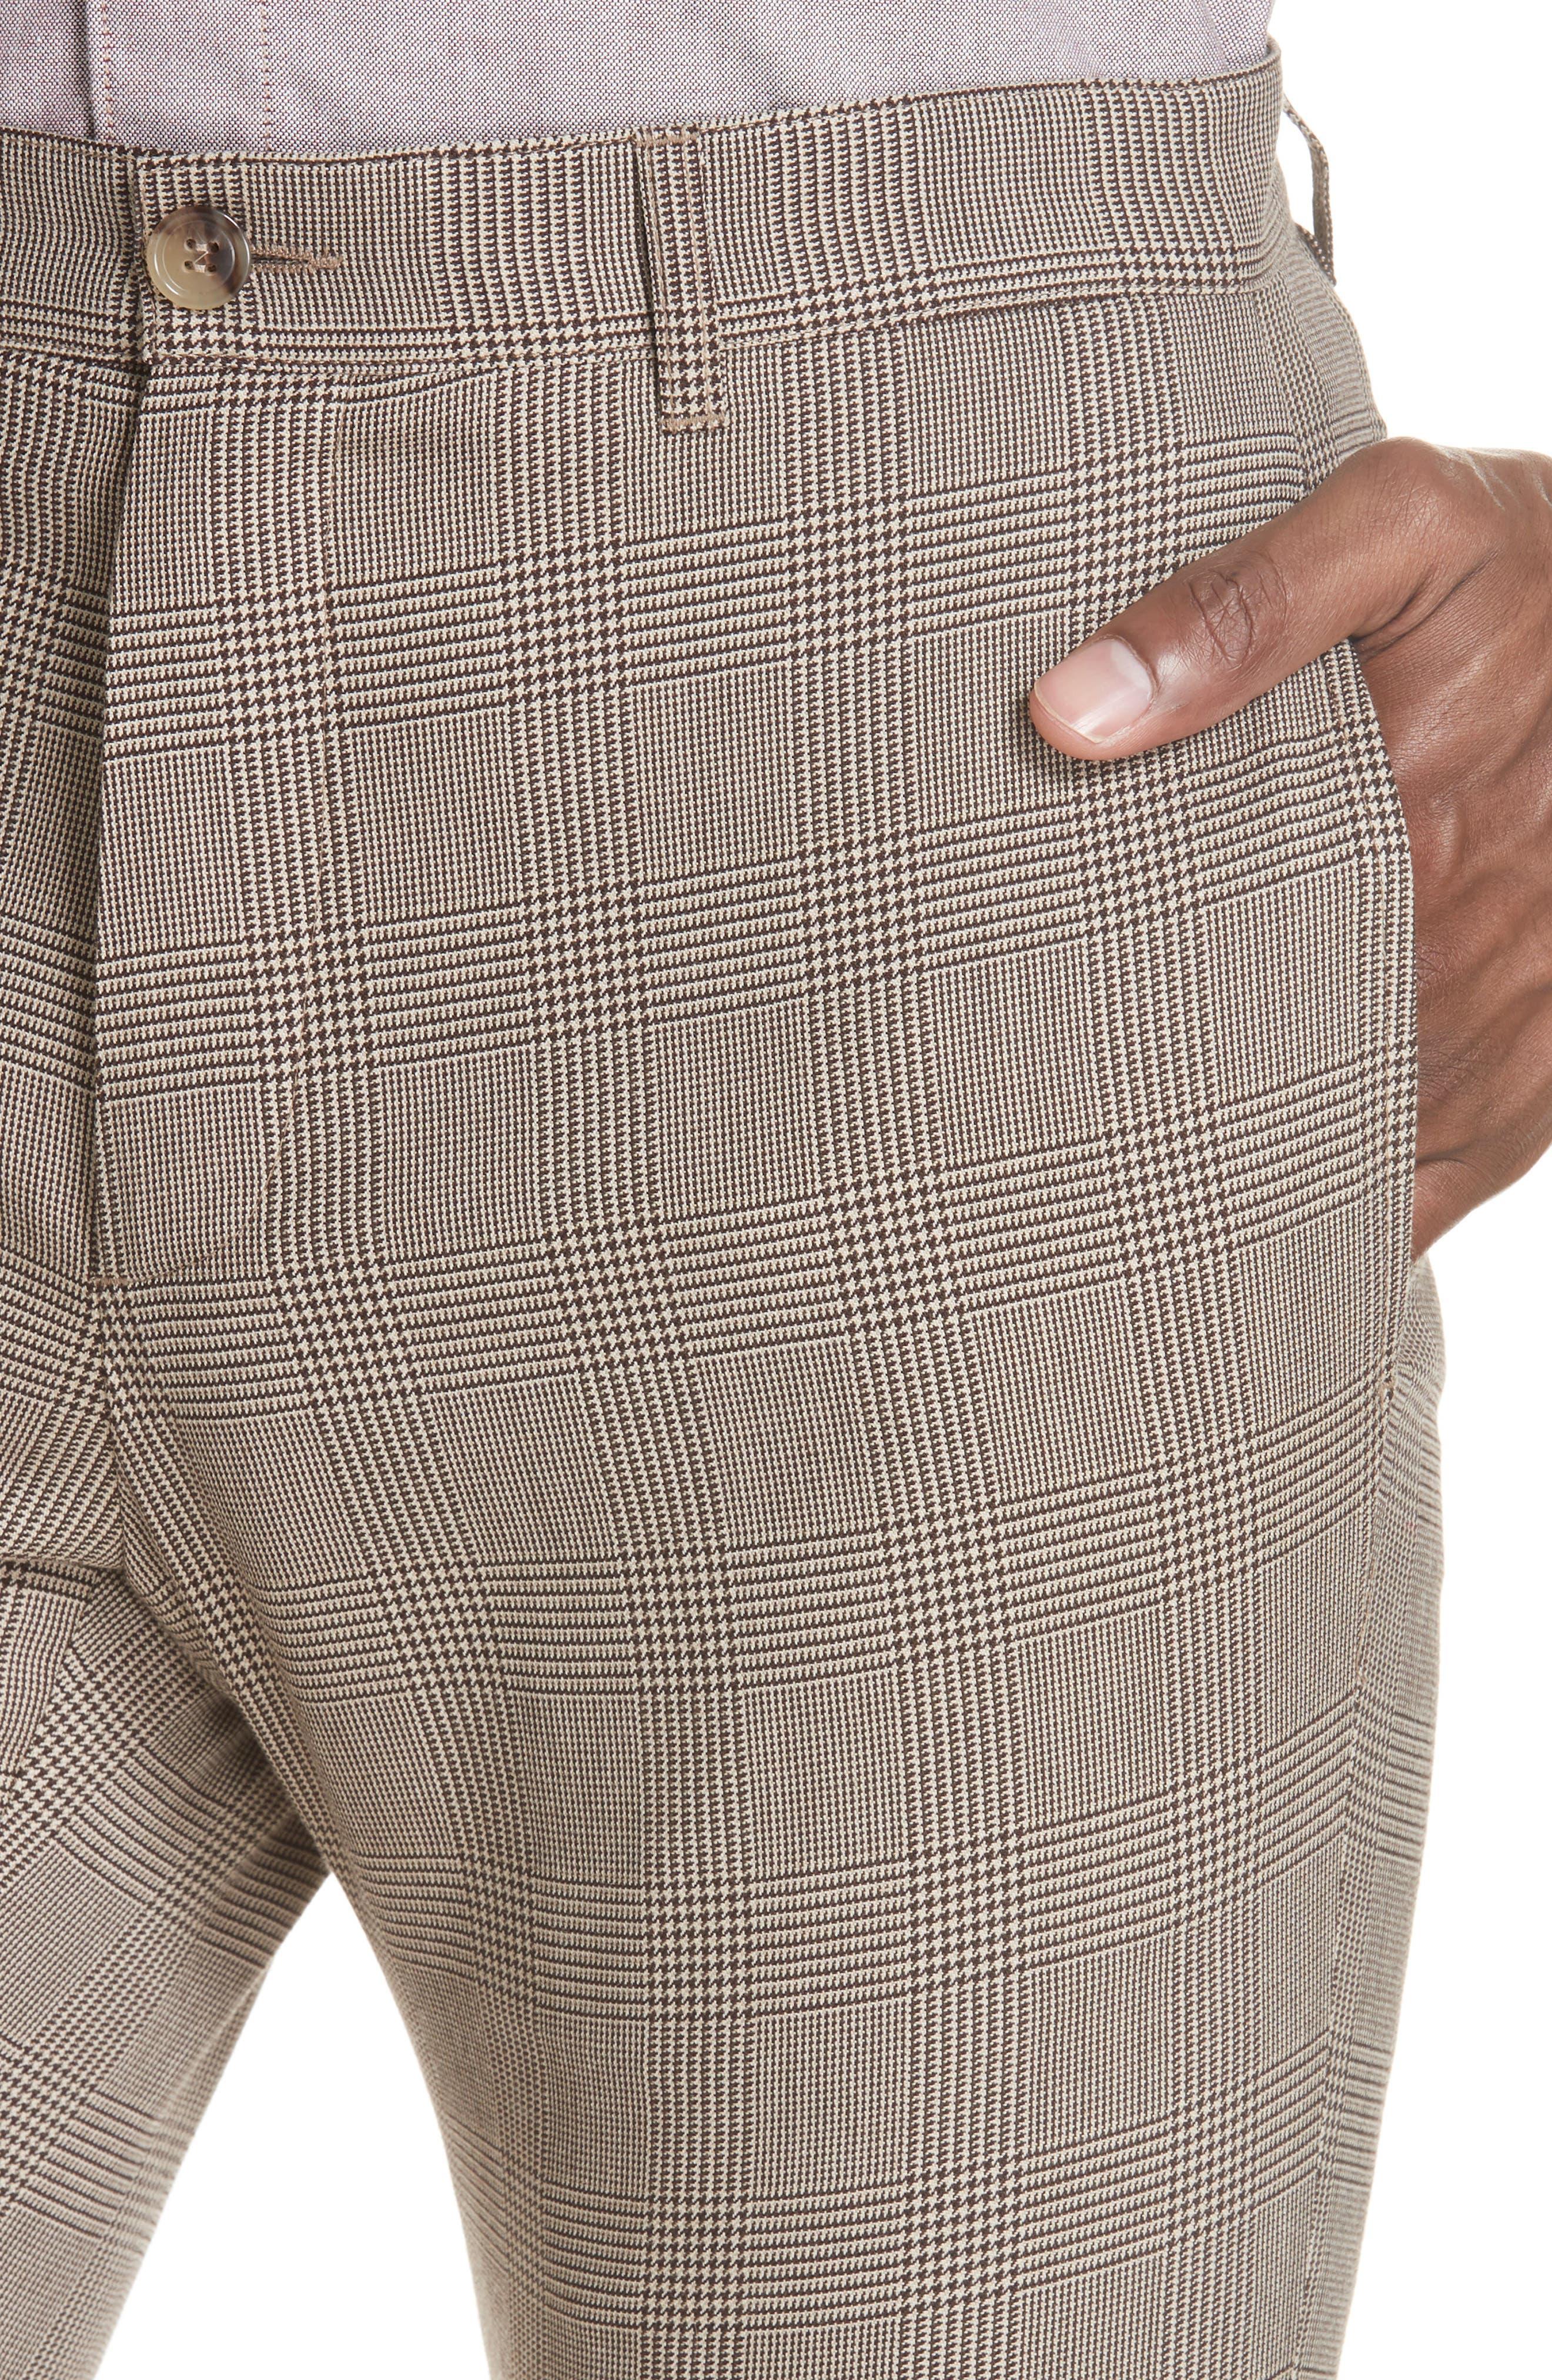 Check Wool Blend Pants,                             Alternate thumbnail 4, color,                             BAC BEIGE